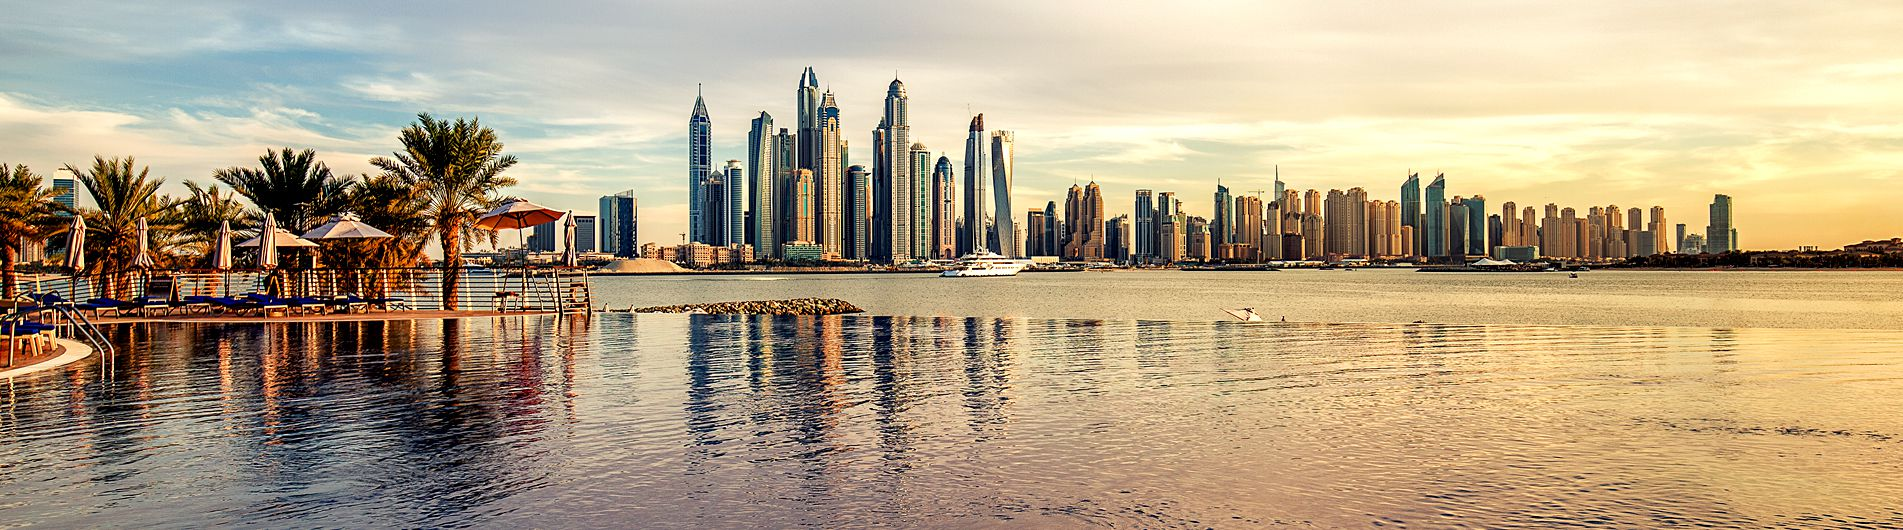 Abu Dhabi City Breaks